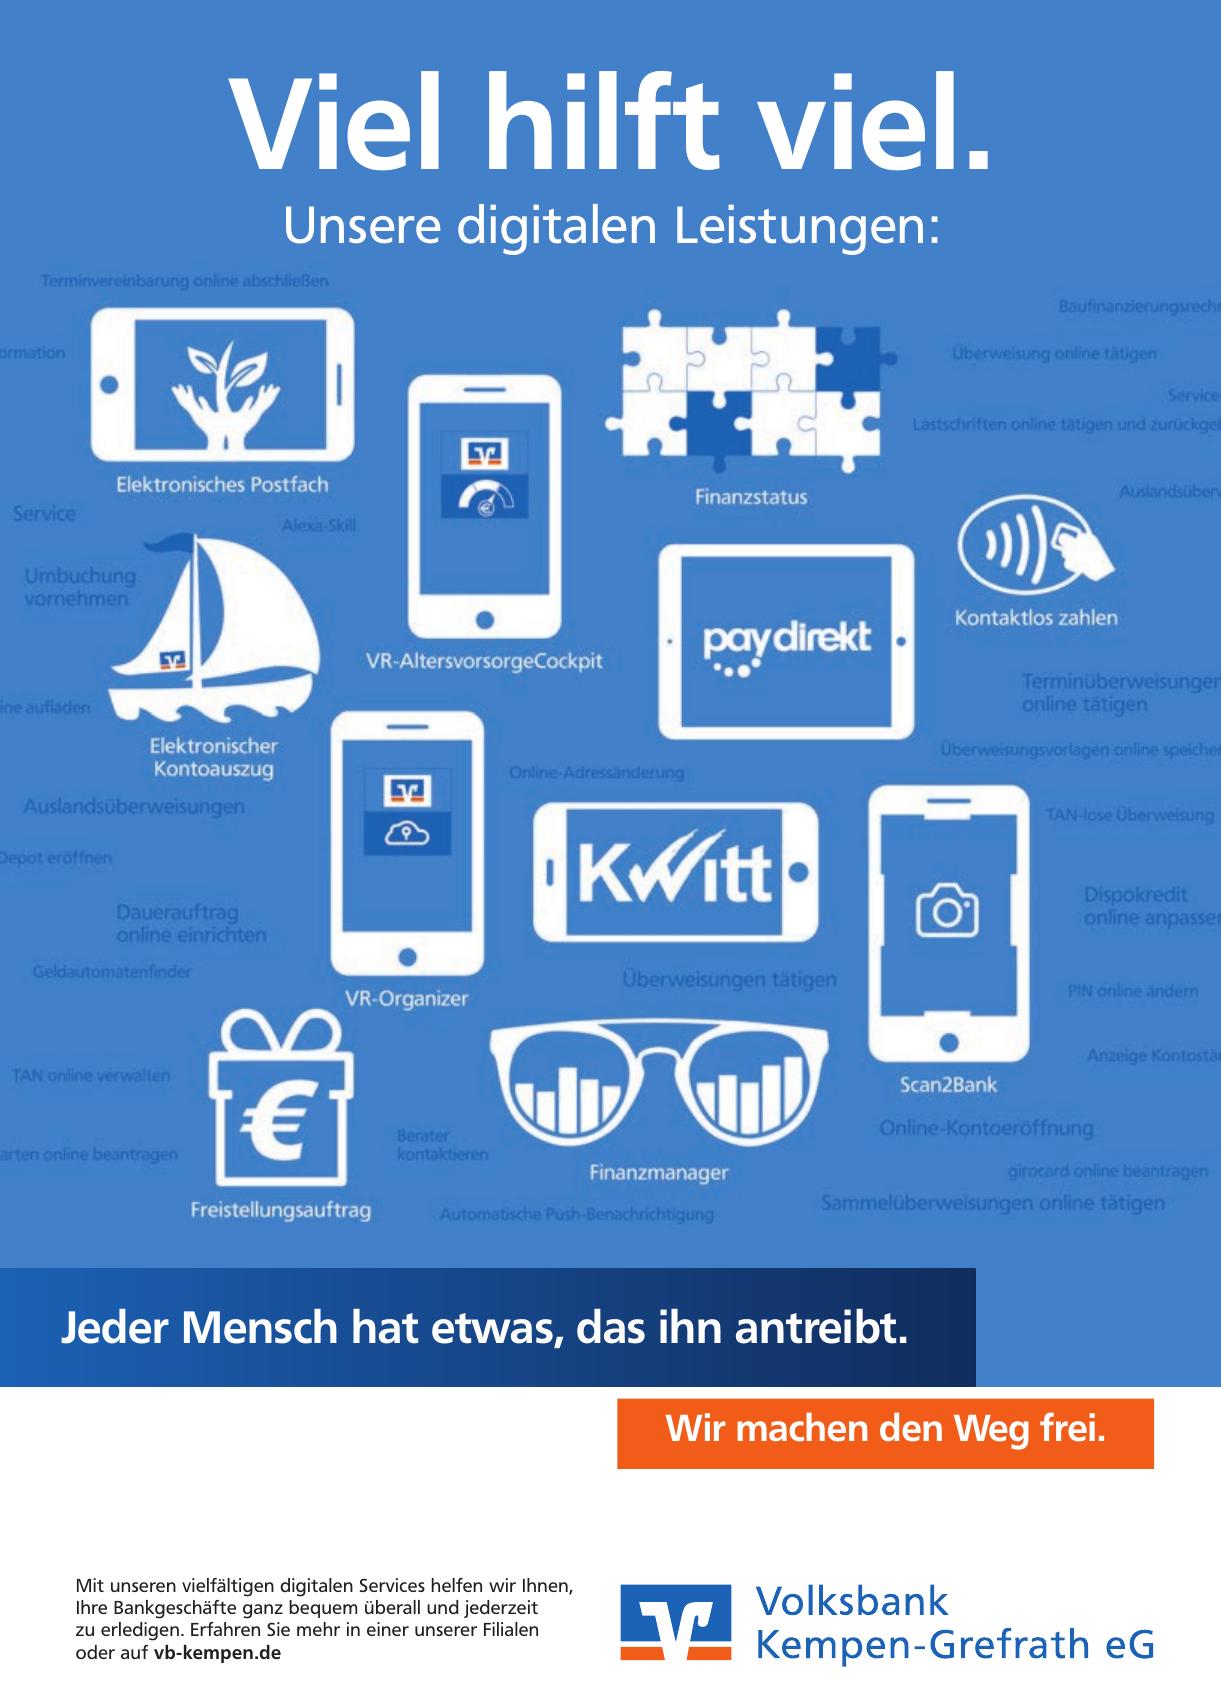 Volksbank Kempen-Grefrath eG